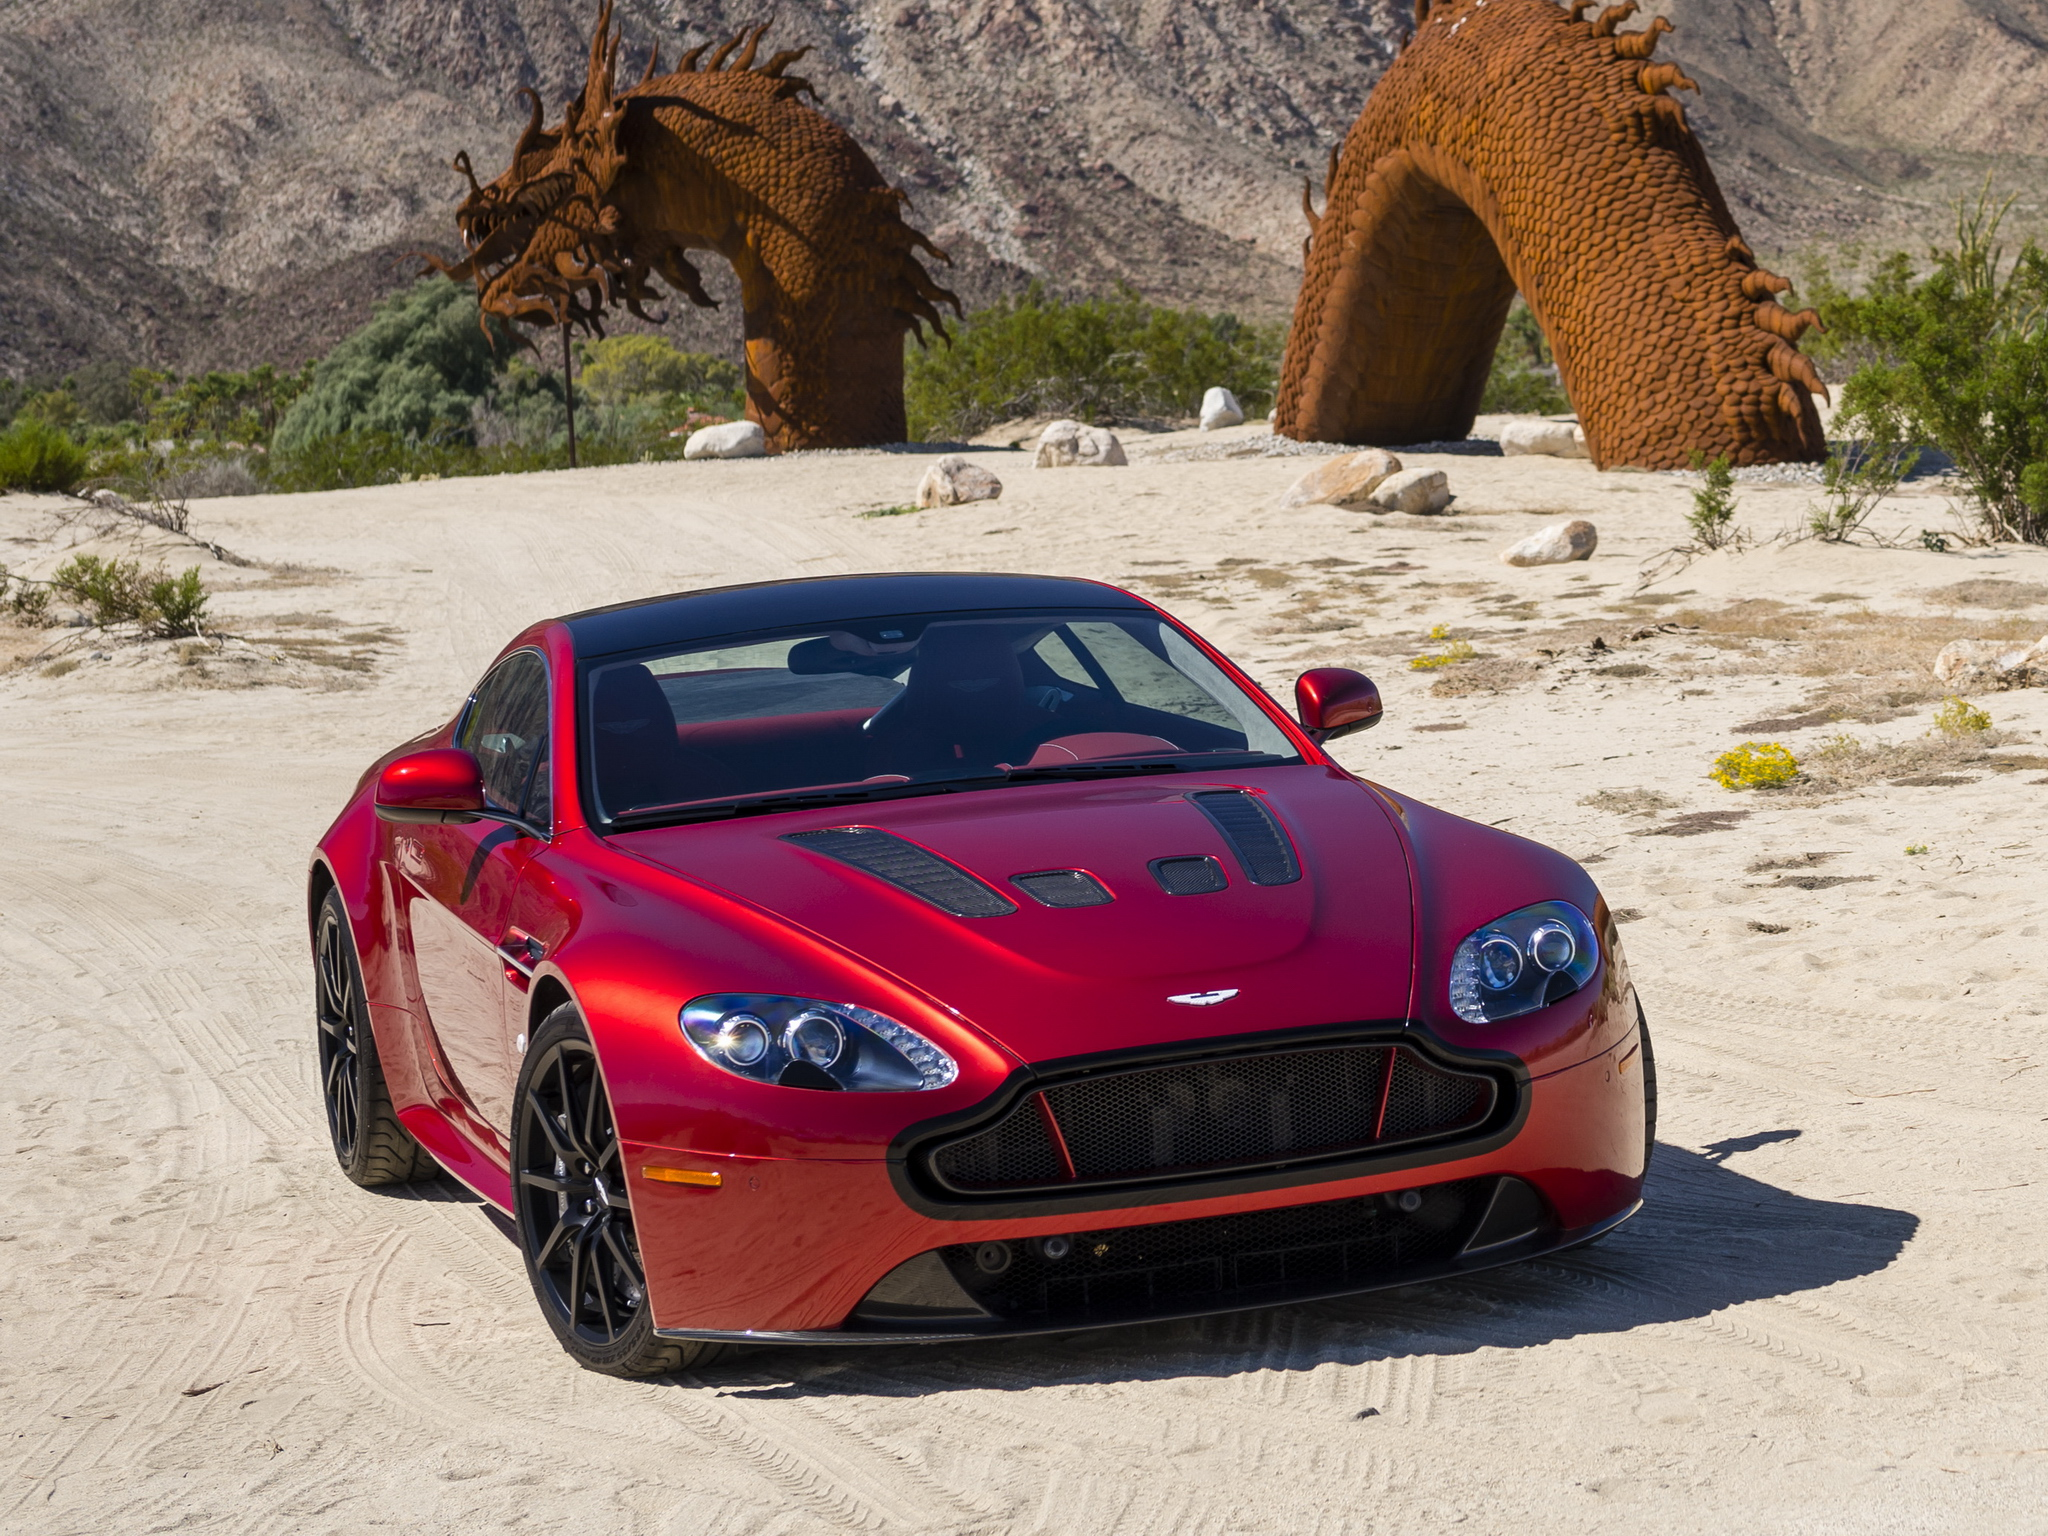 Nice Images Collection: 2014 Aston Martin V12 Vantage S Desktop Wallpapers